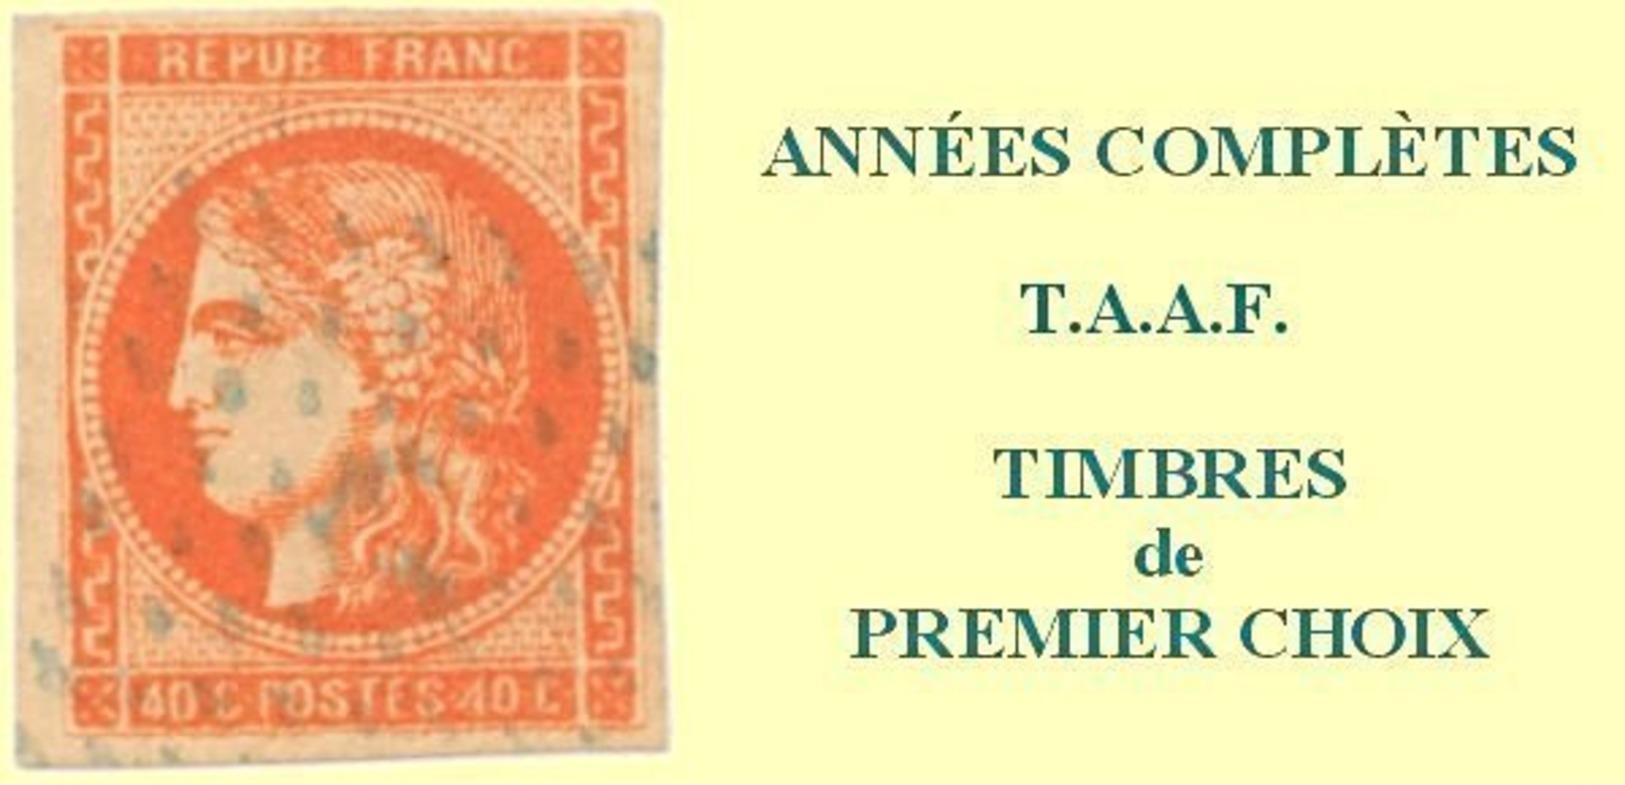 TAAF, Année Complète 1980**, Poste N°86 à N°91, P.A. N°61 à N°64 Y & T - Komplette Jahrgänge